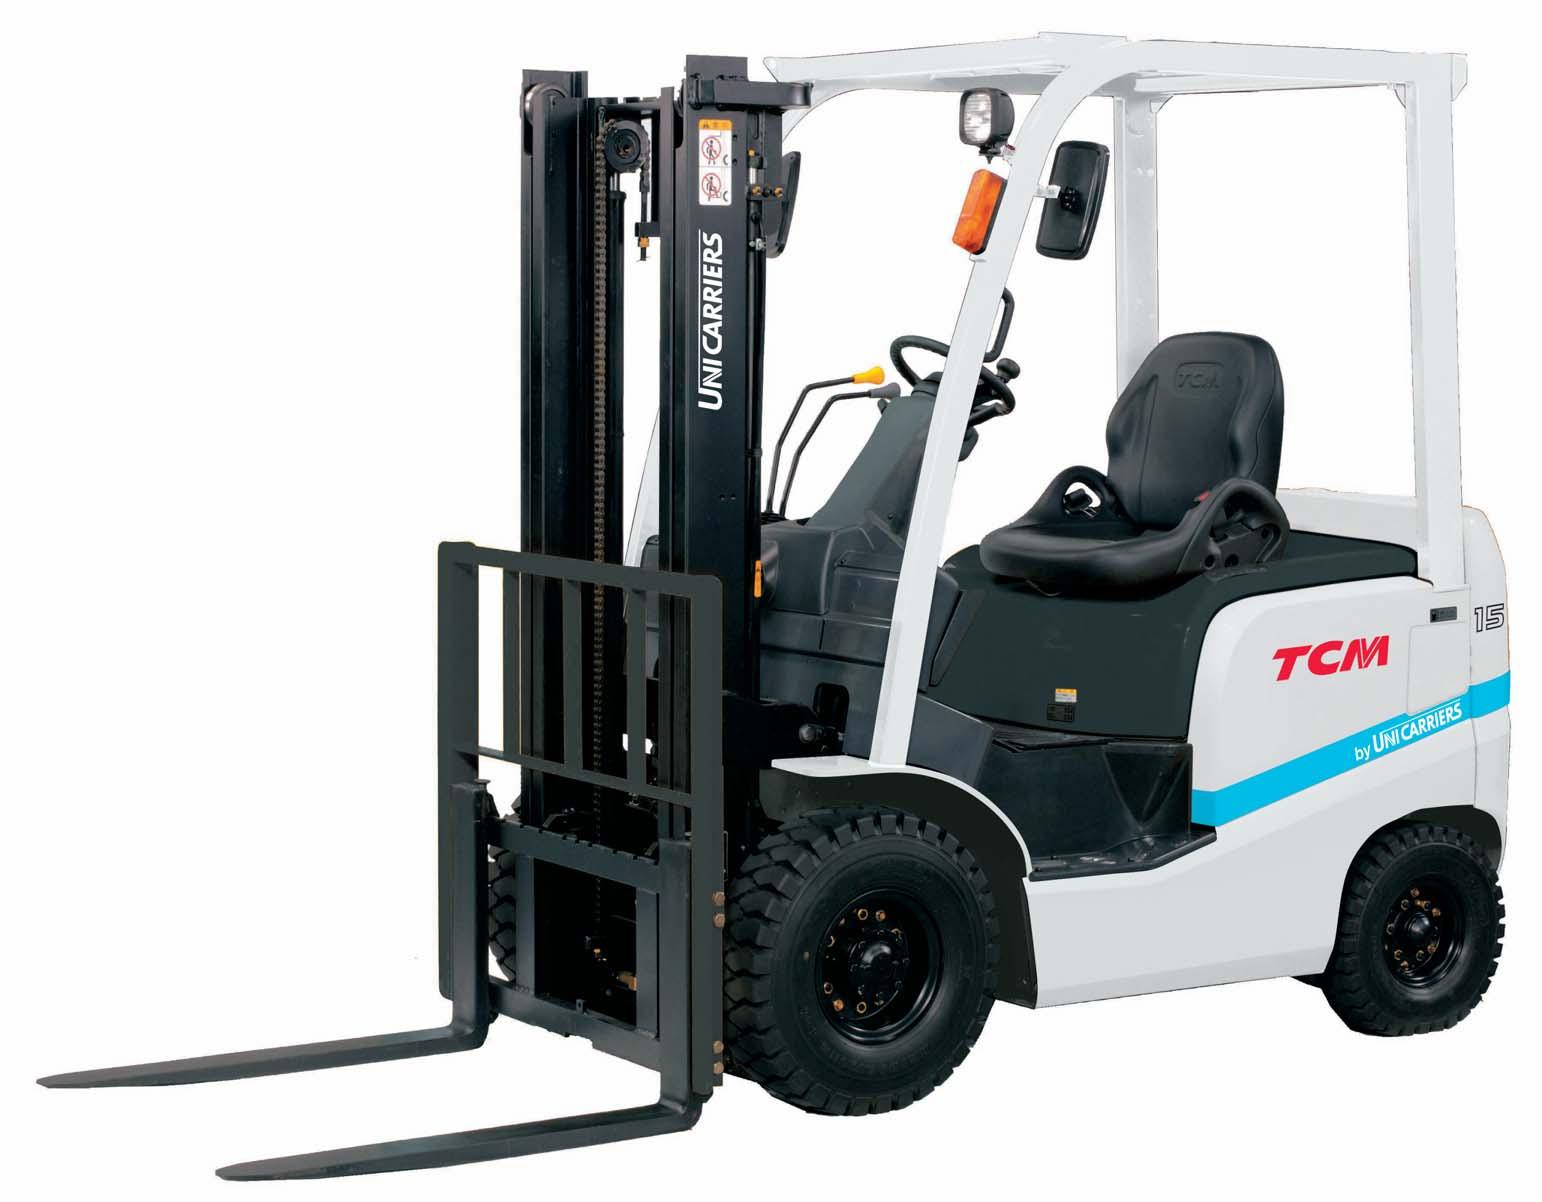 TCM FG20C3